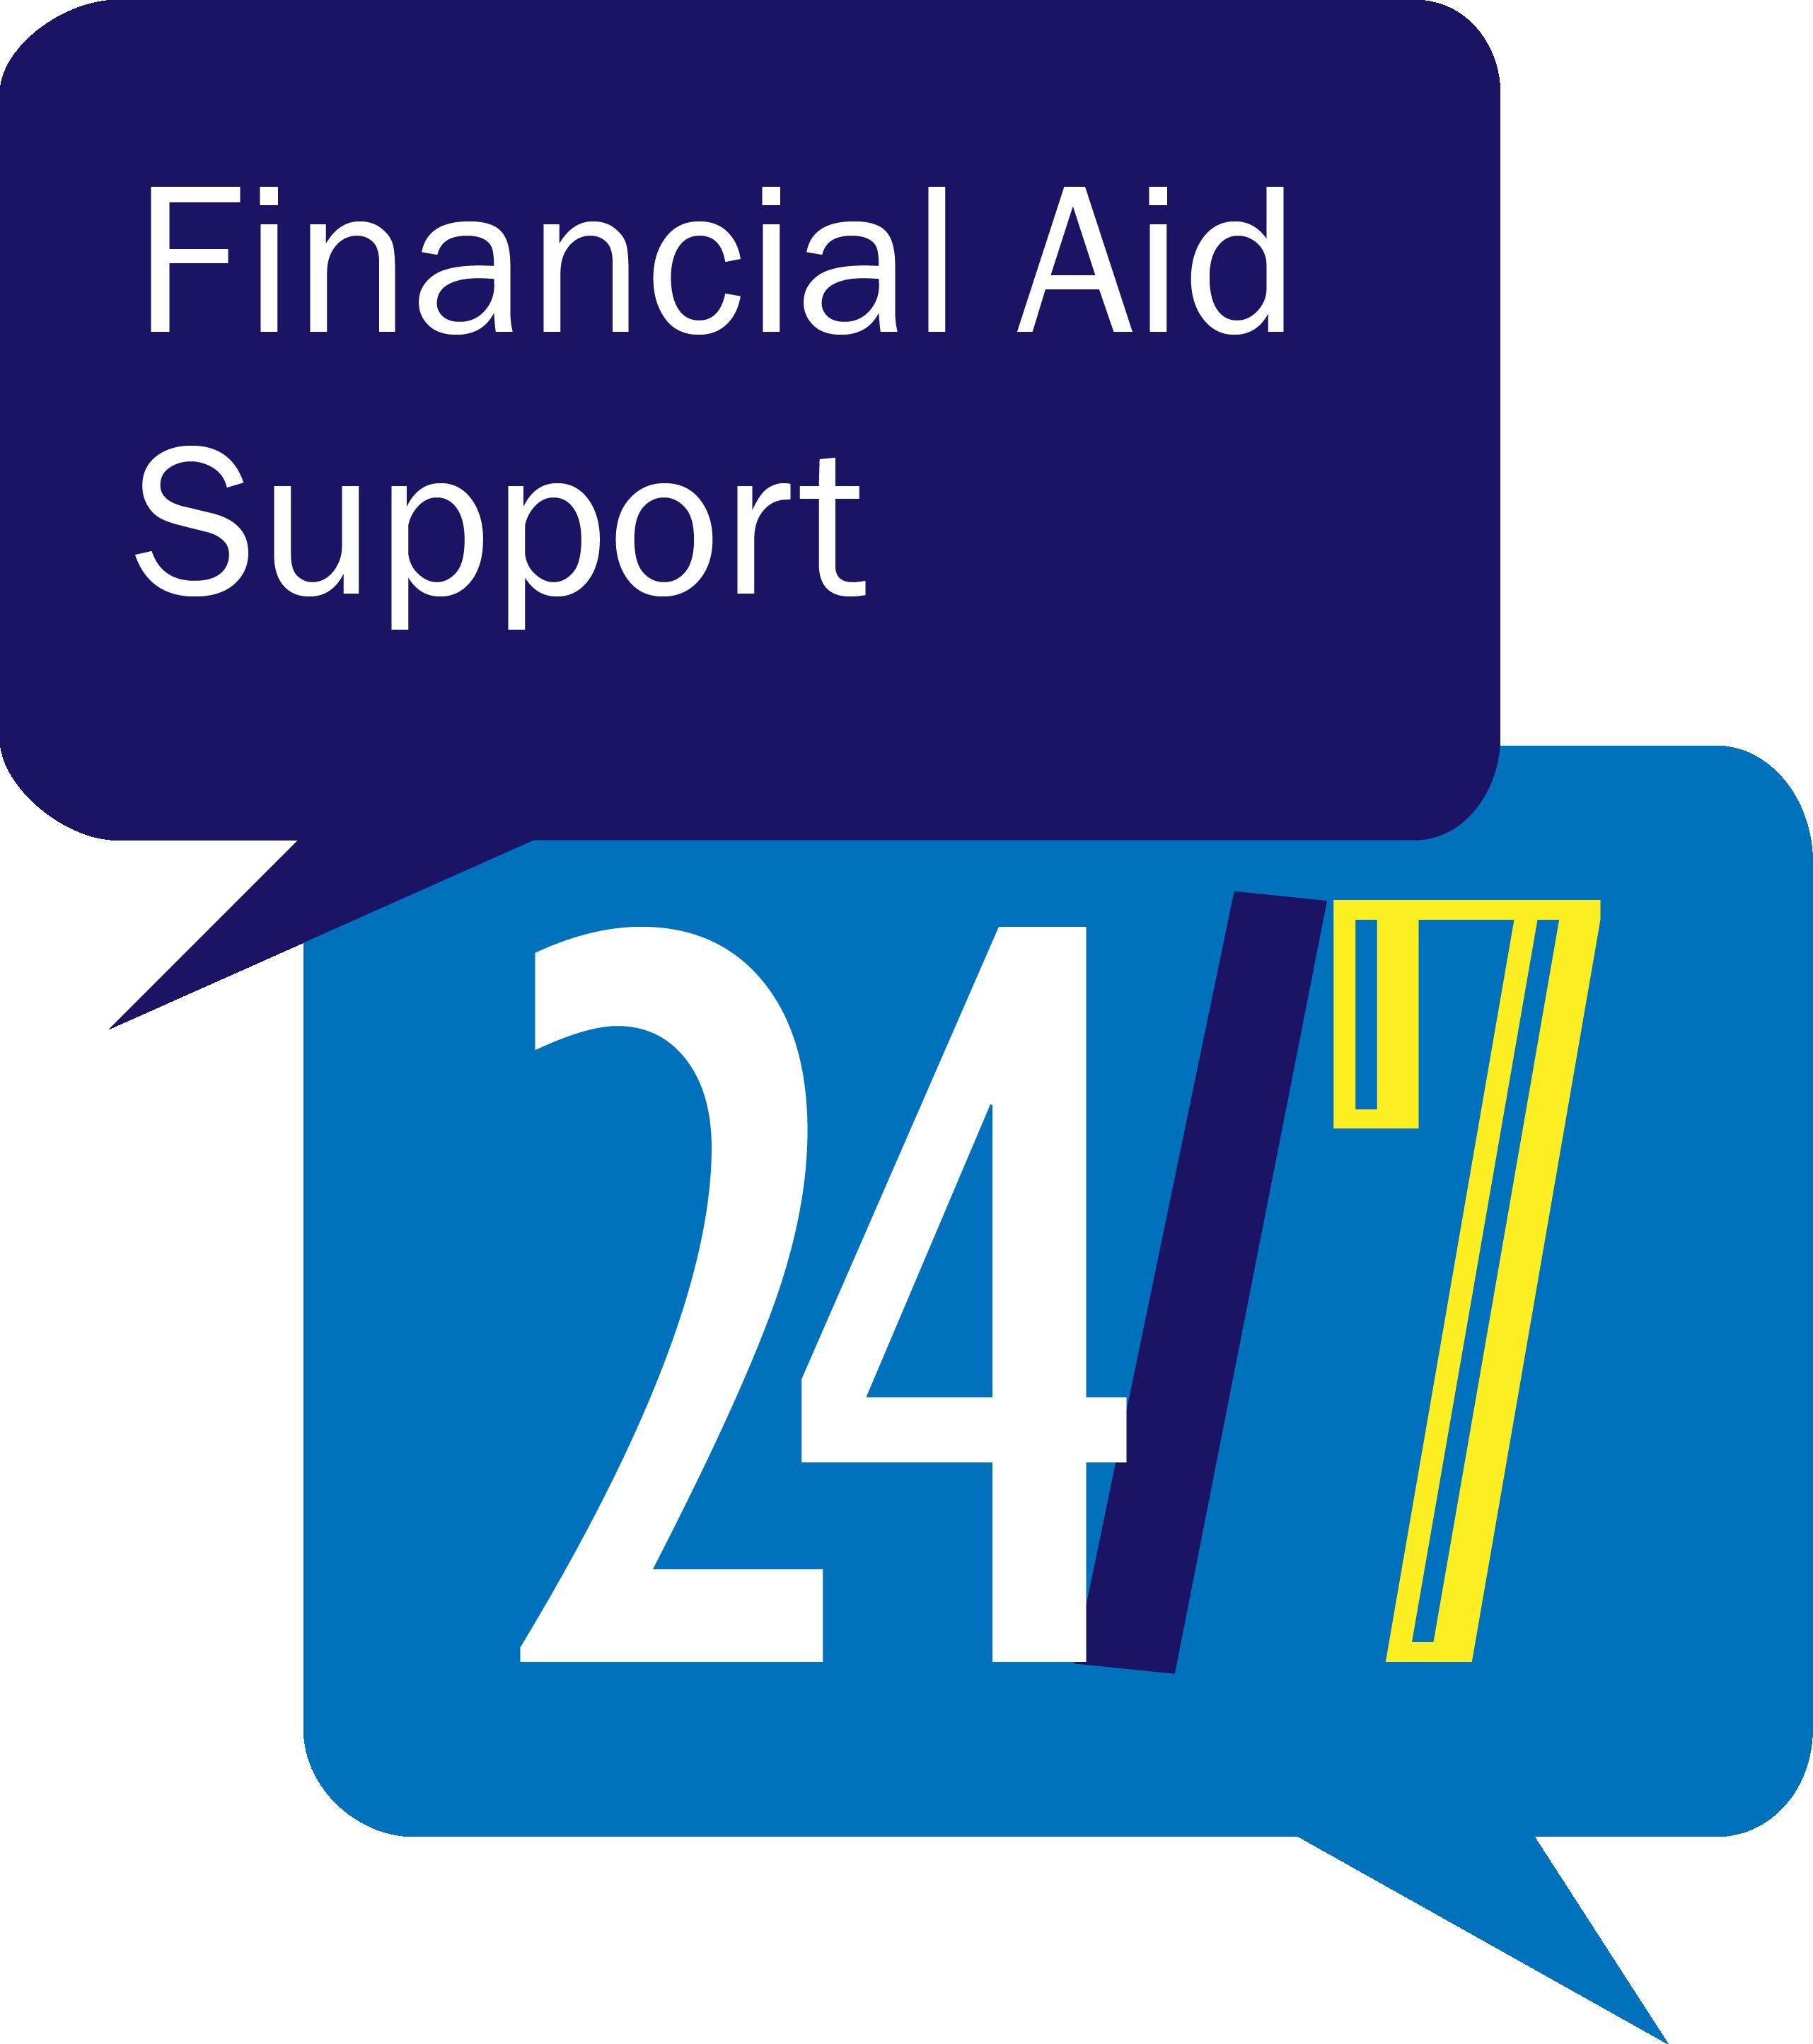 FinancialAid247